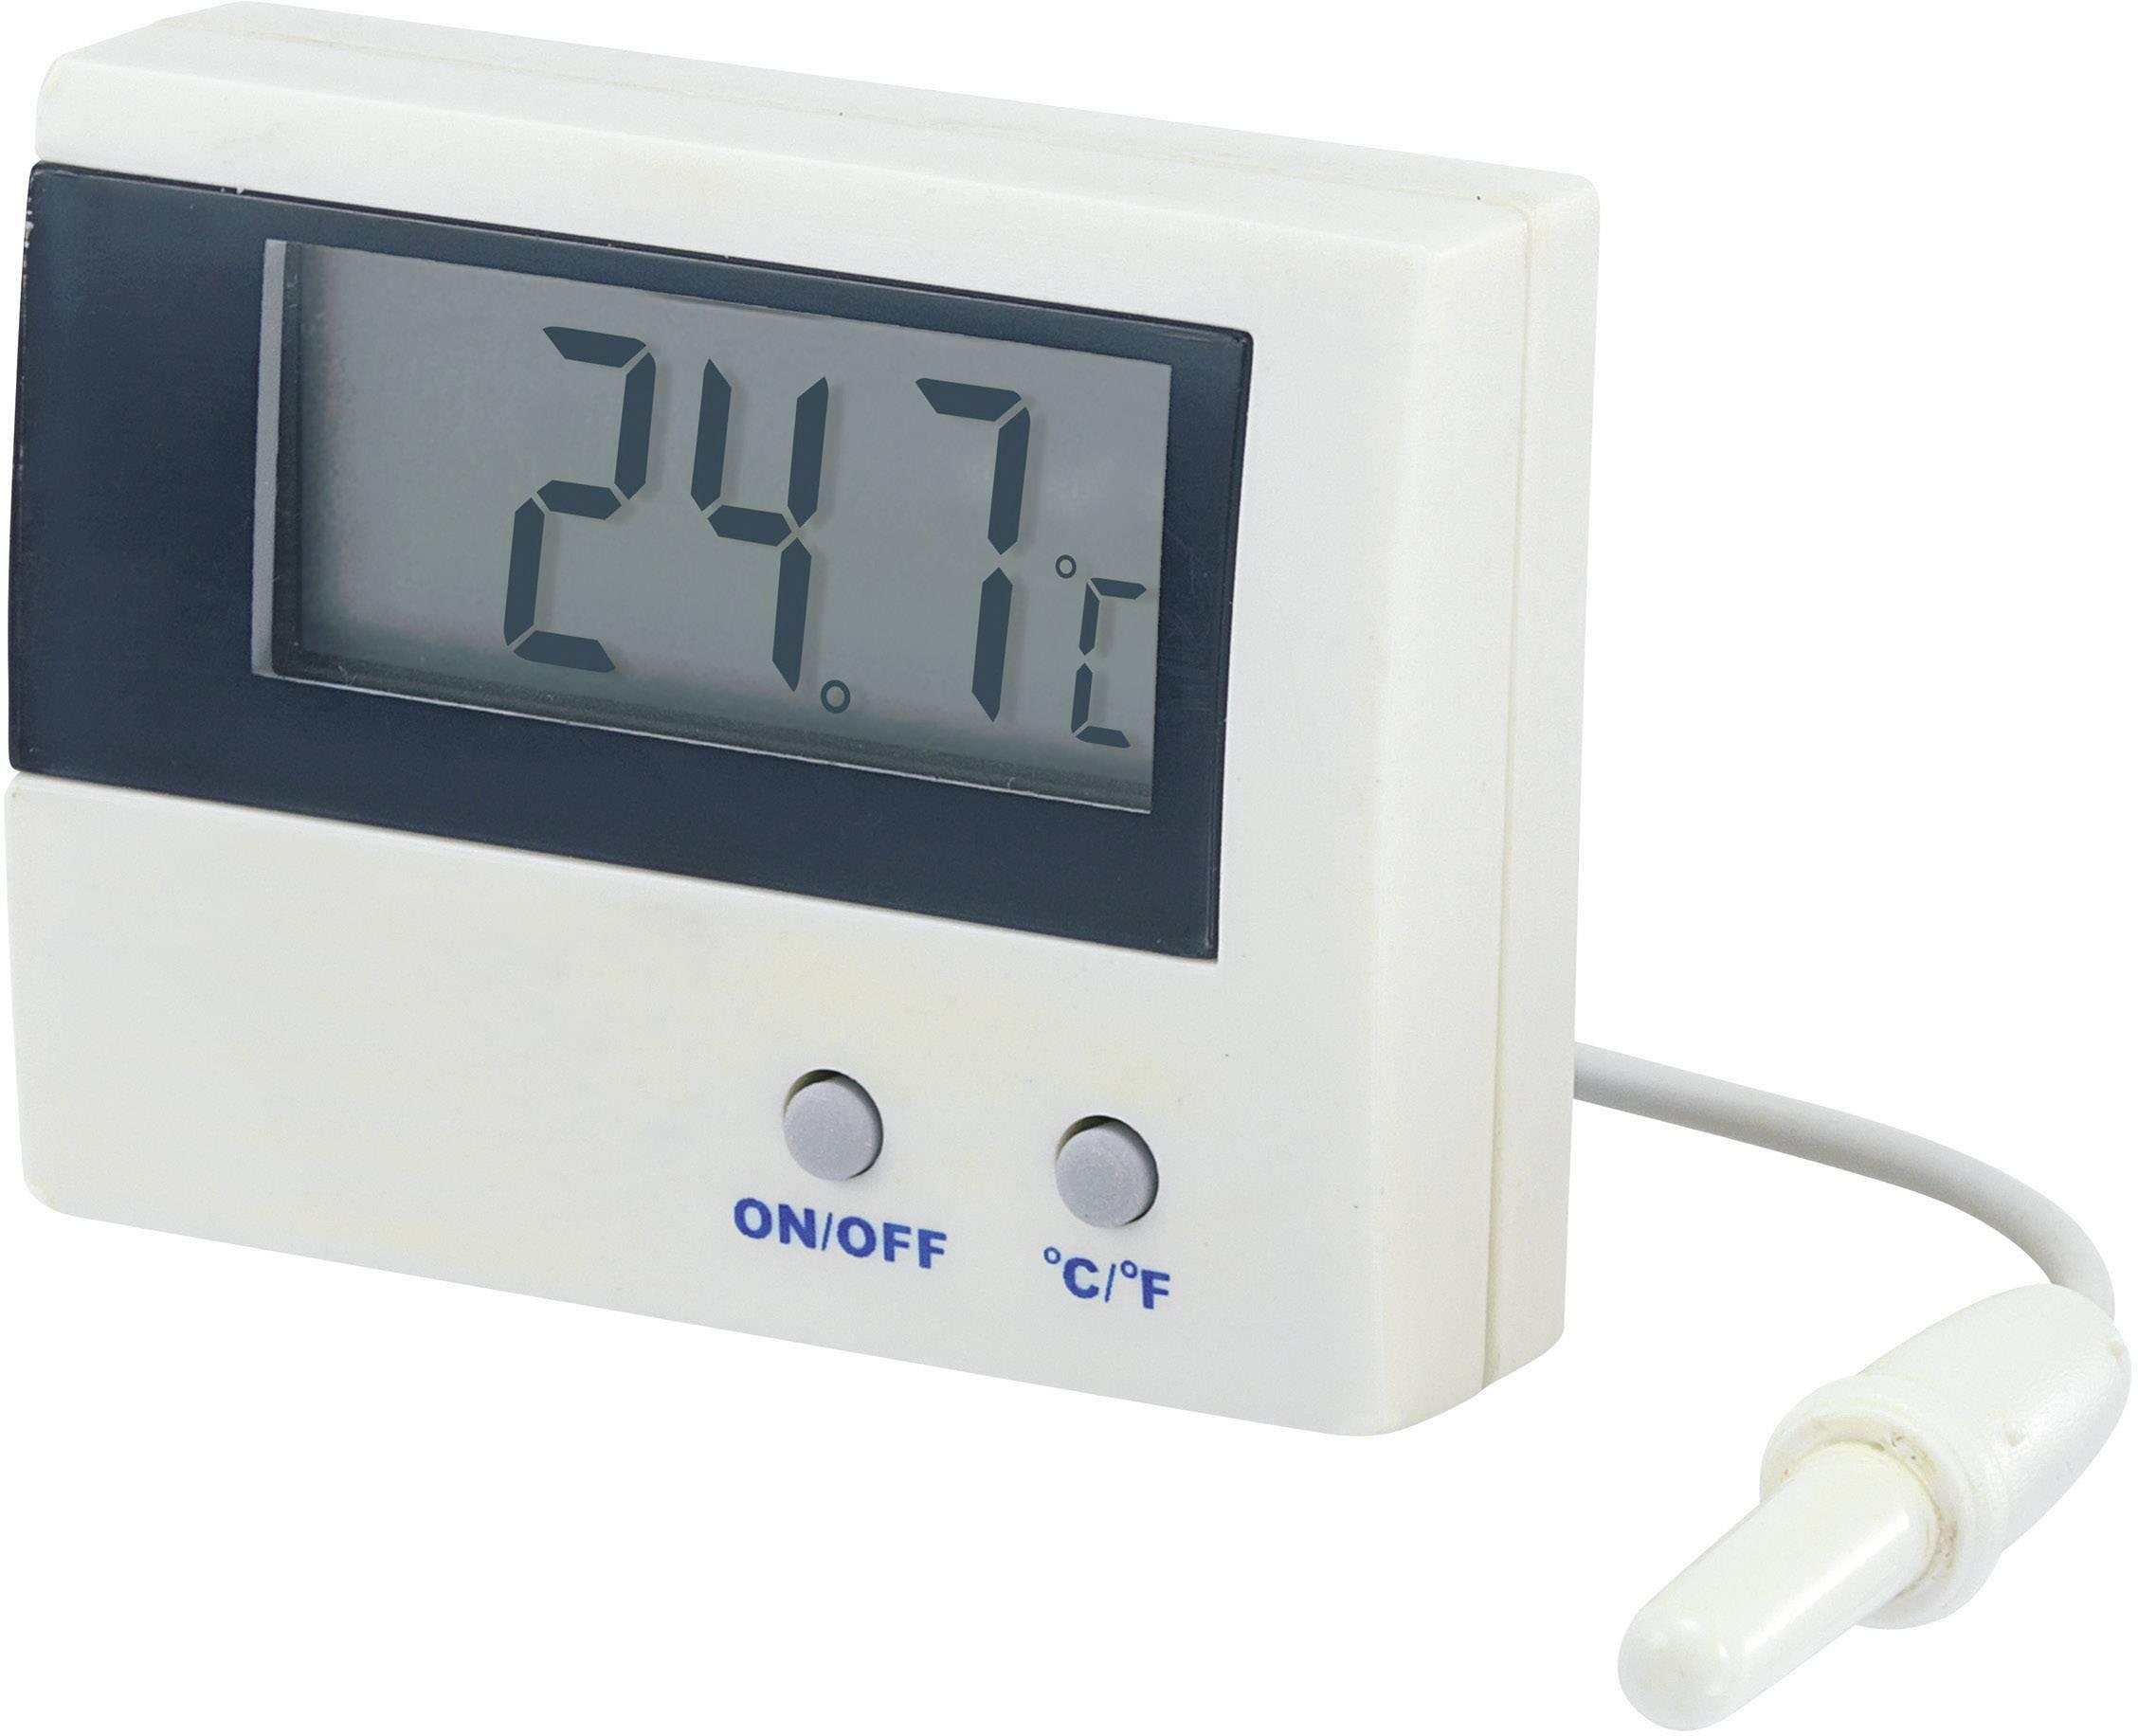 Digitálny teplomer BASETech LT-80, -50 až +80 °C